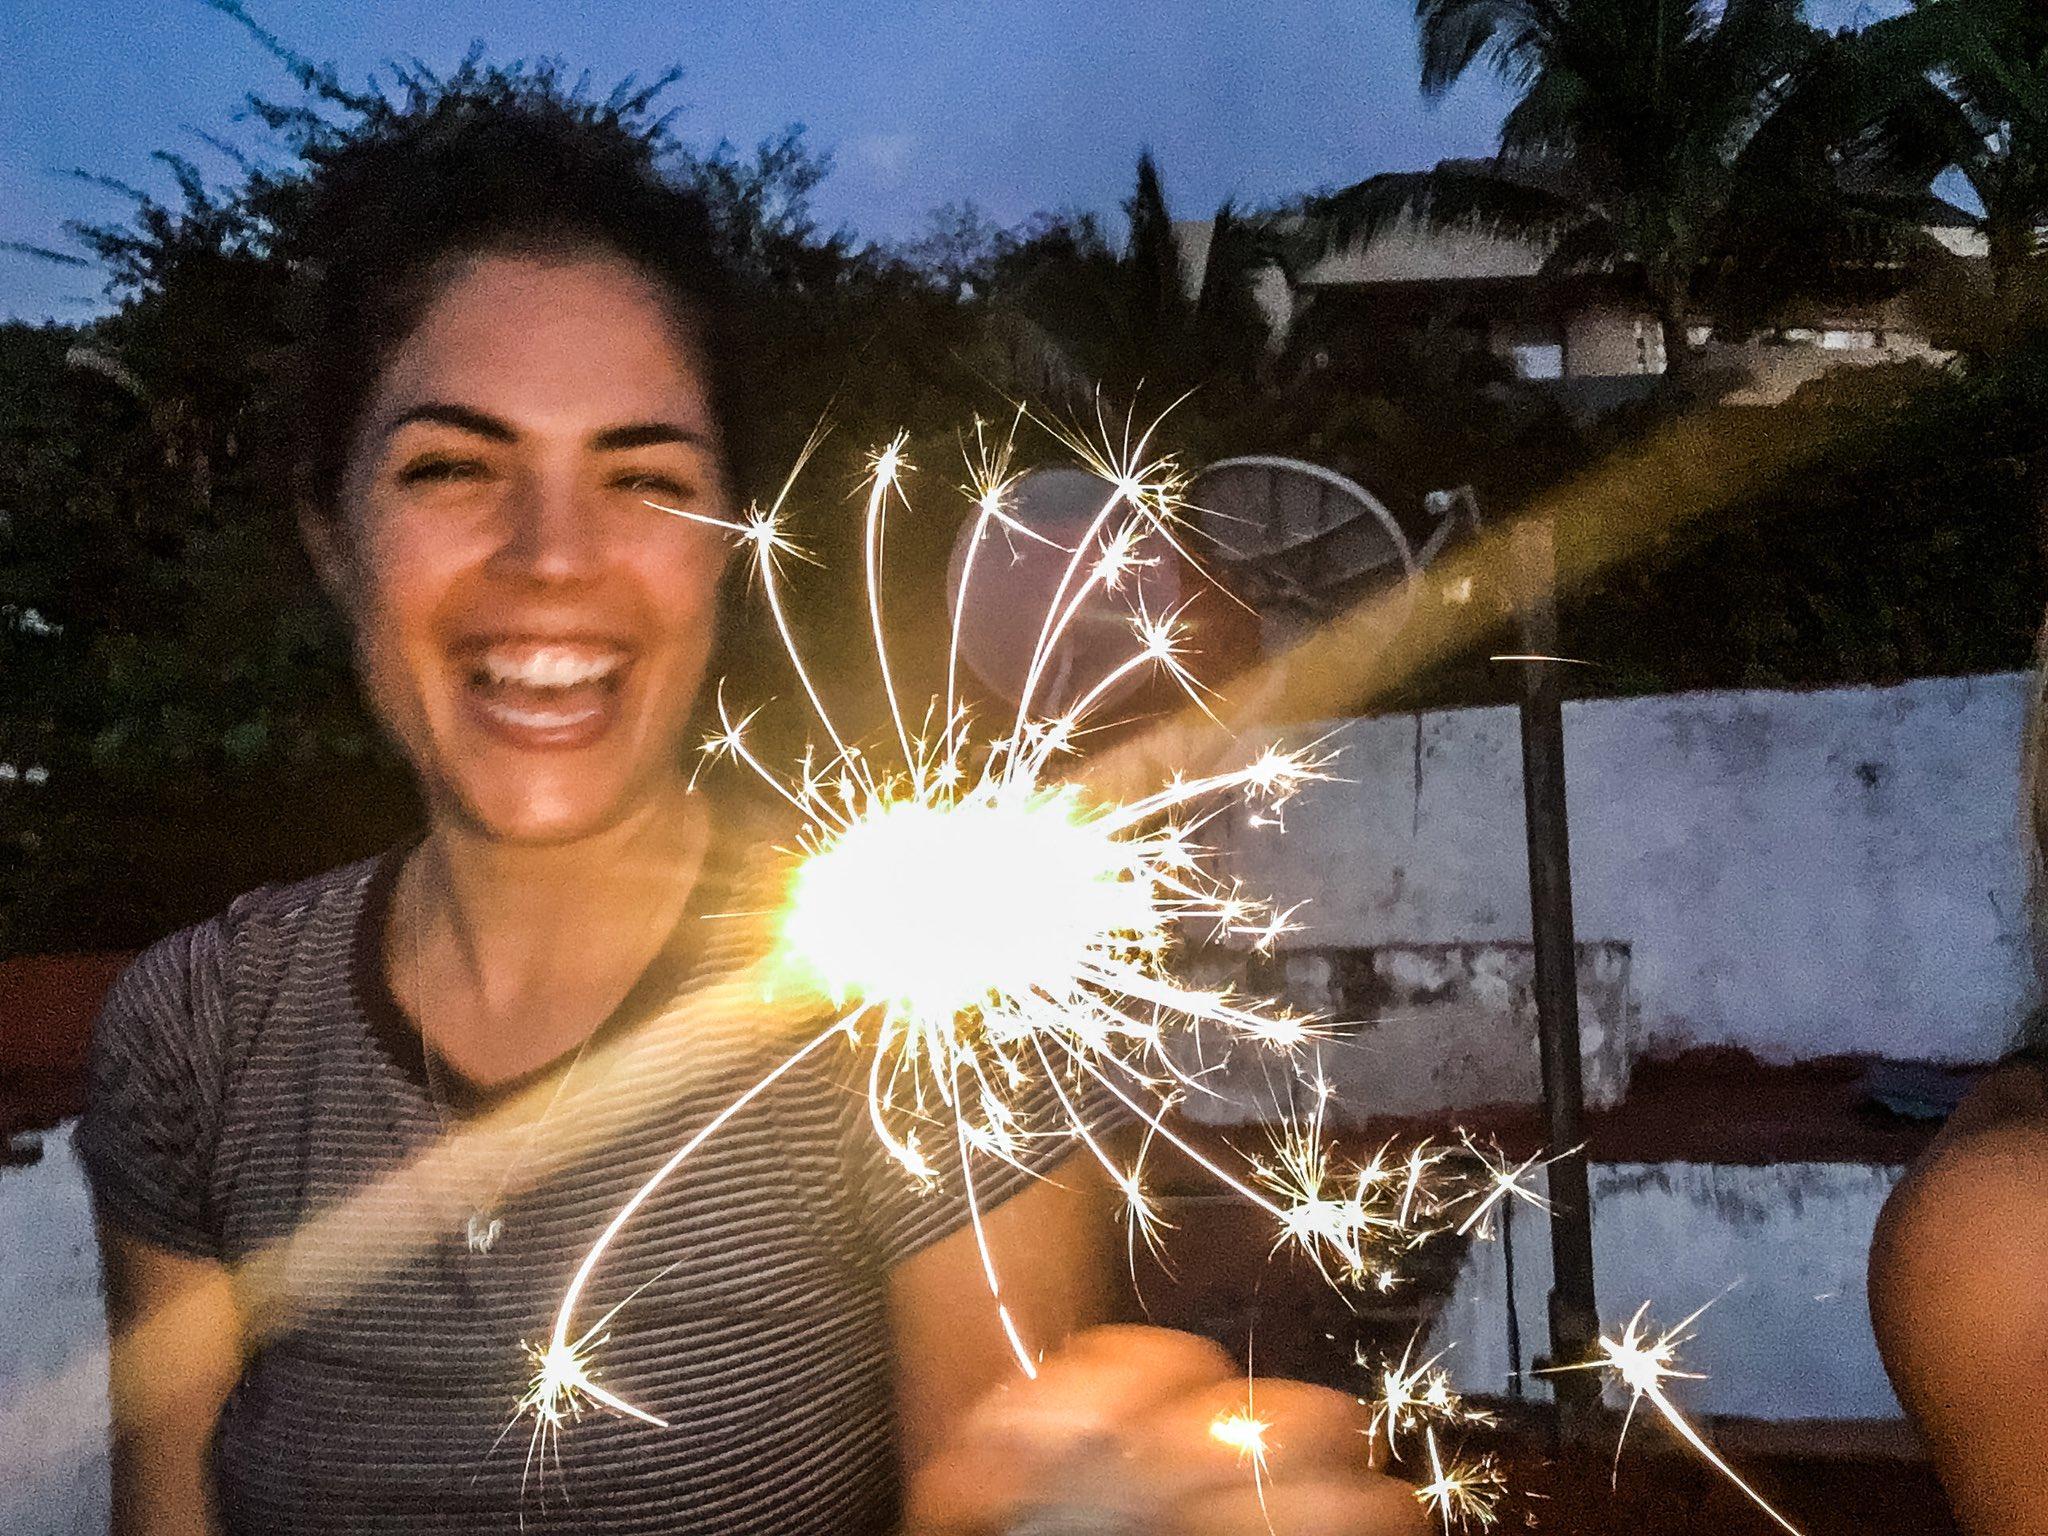 Kelly Thiebaud sparklers - Twitter